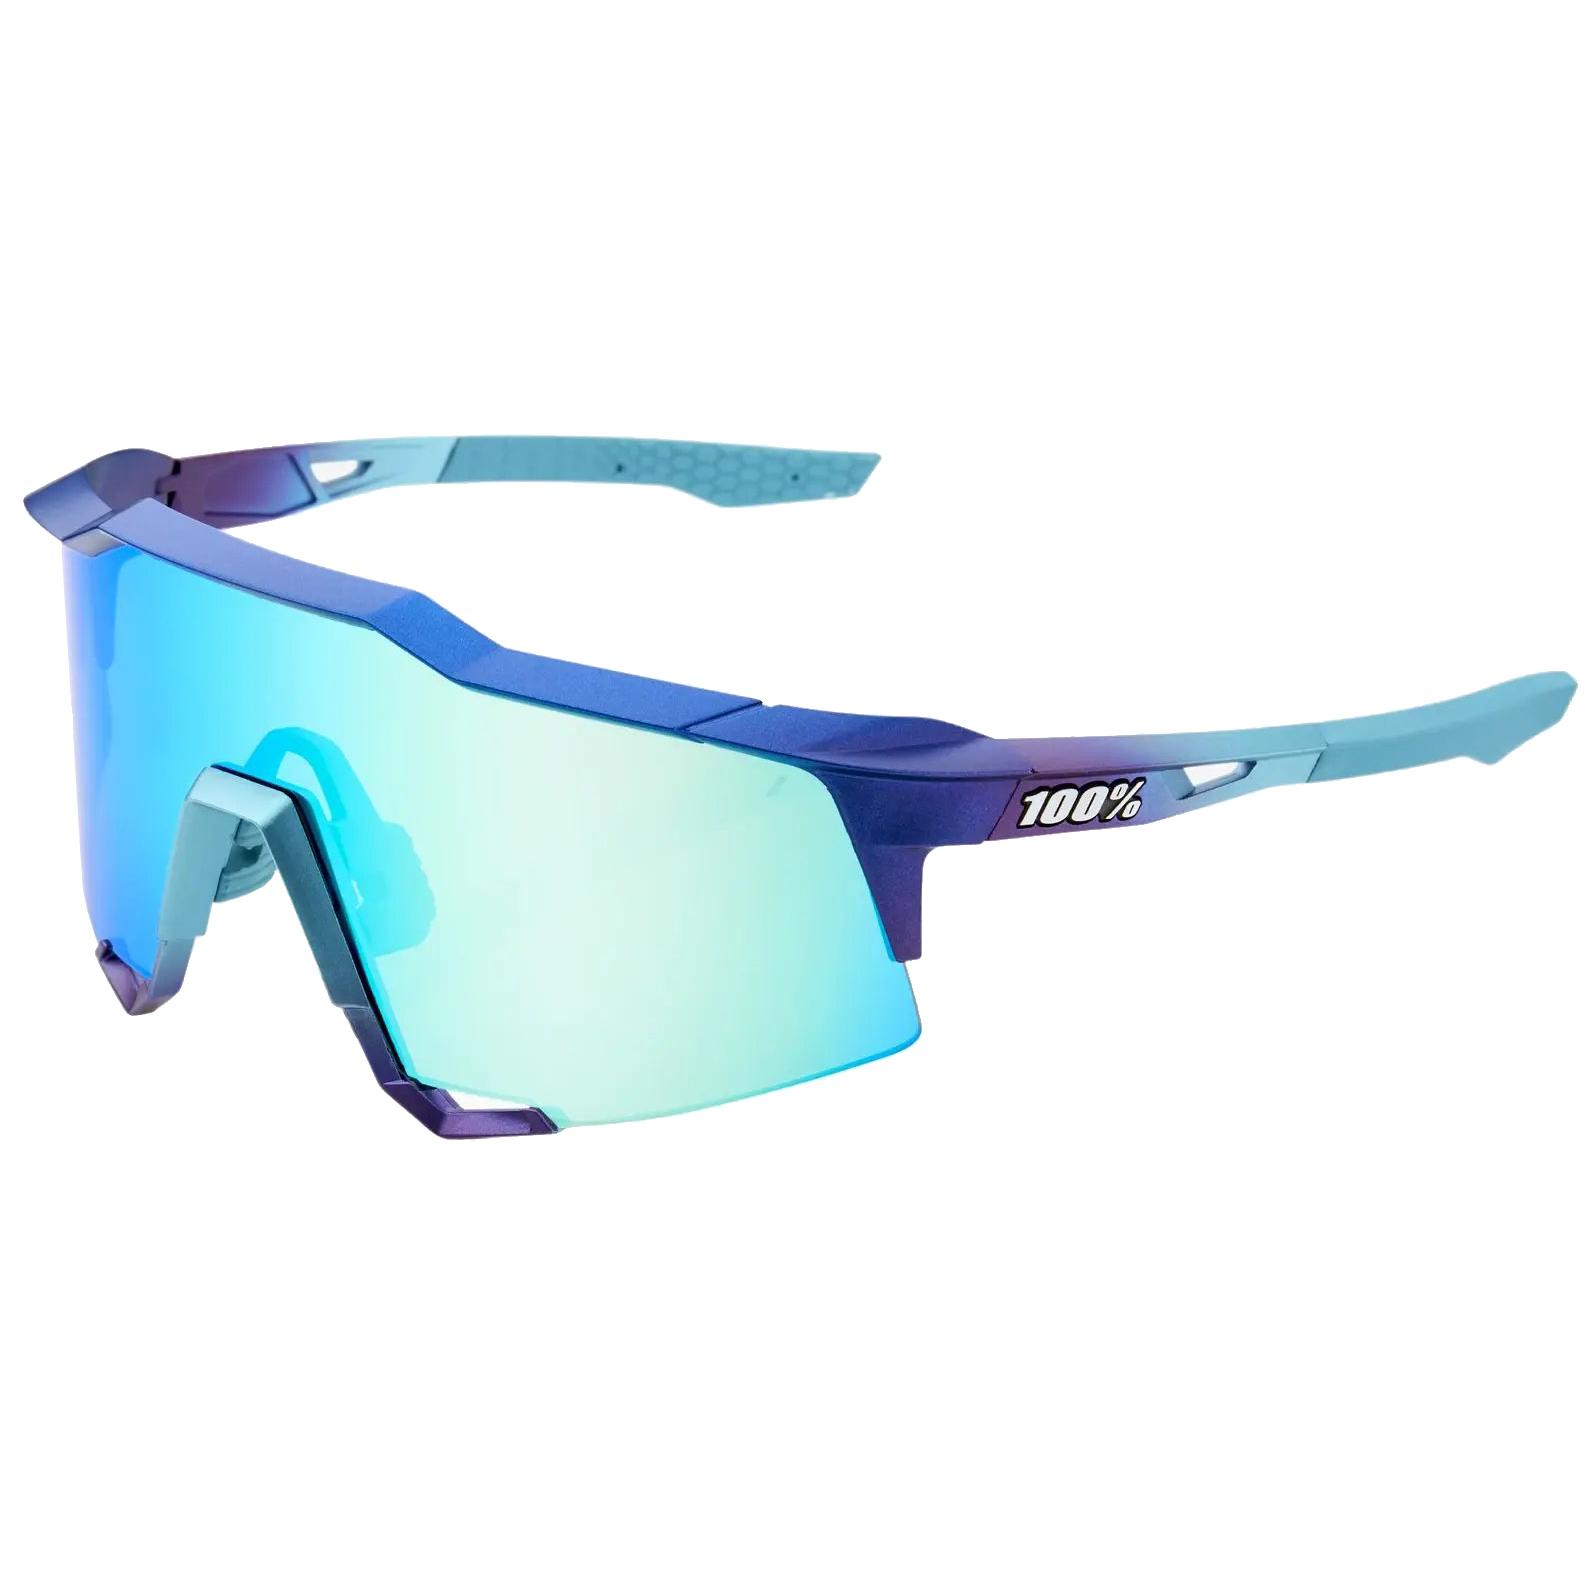 100% Speedcraft - Tall - Mirror Lense Gafas - Matte Metallic Into the Fade/Blue Topaz Multilayer + Clear